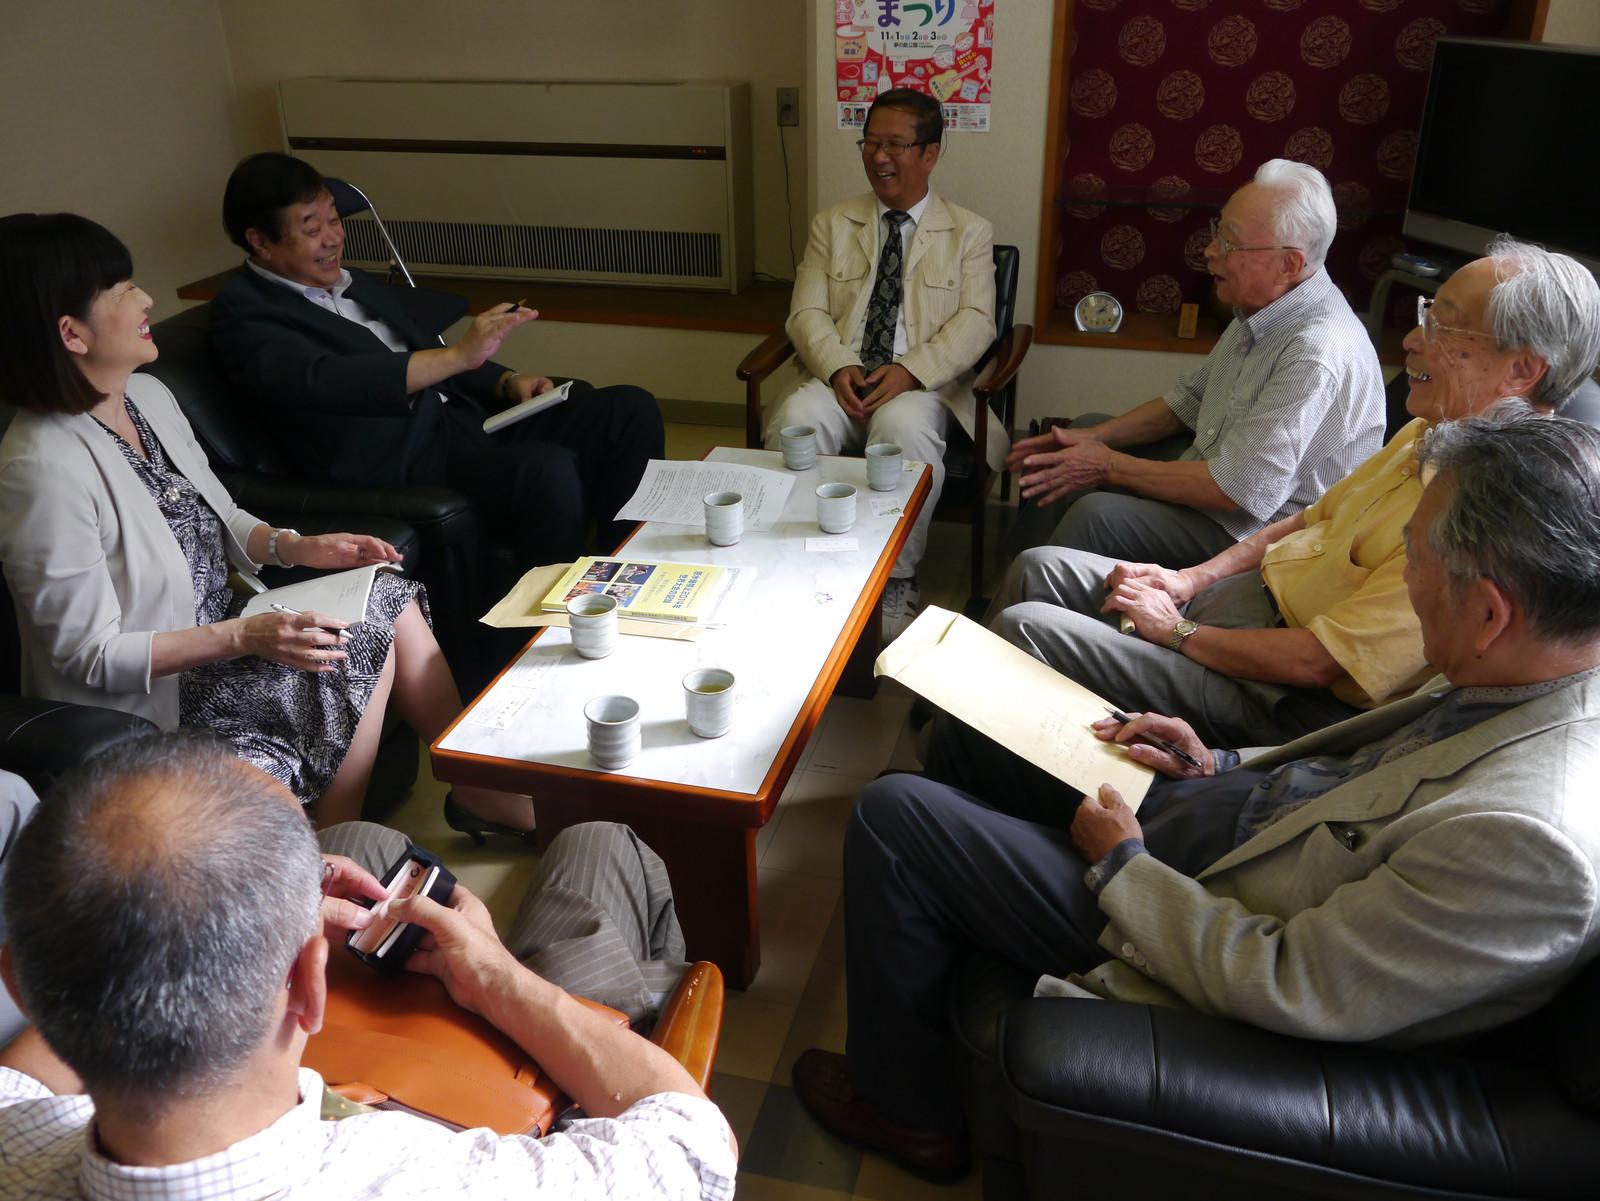 東京原水協(右側)と懇談する(左側奥から)若林都委員長、望月副委員長=3日、日本共産党東京都委員会